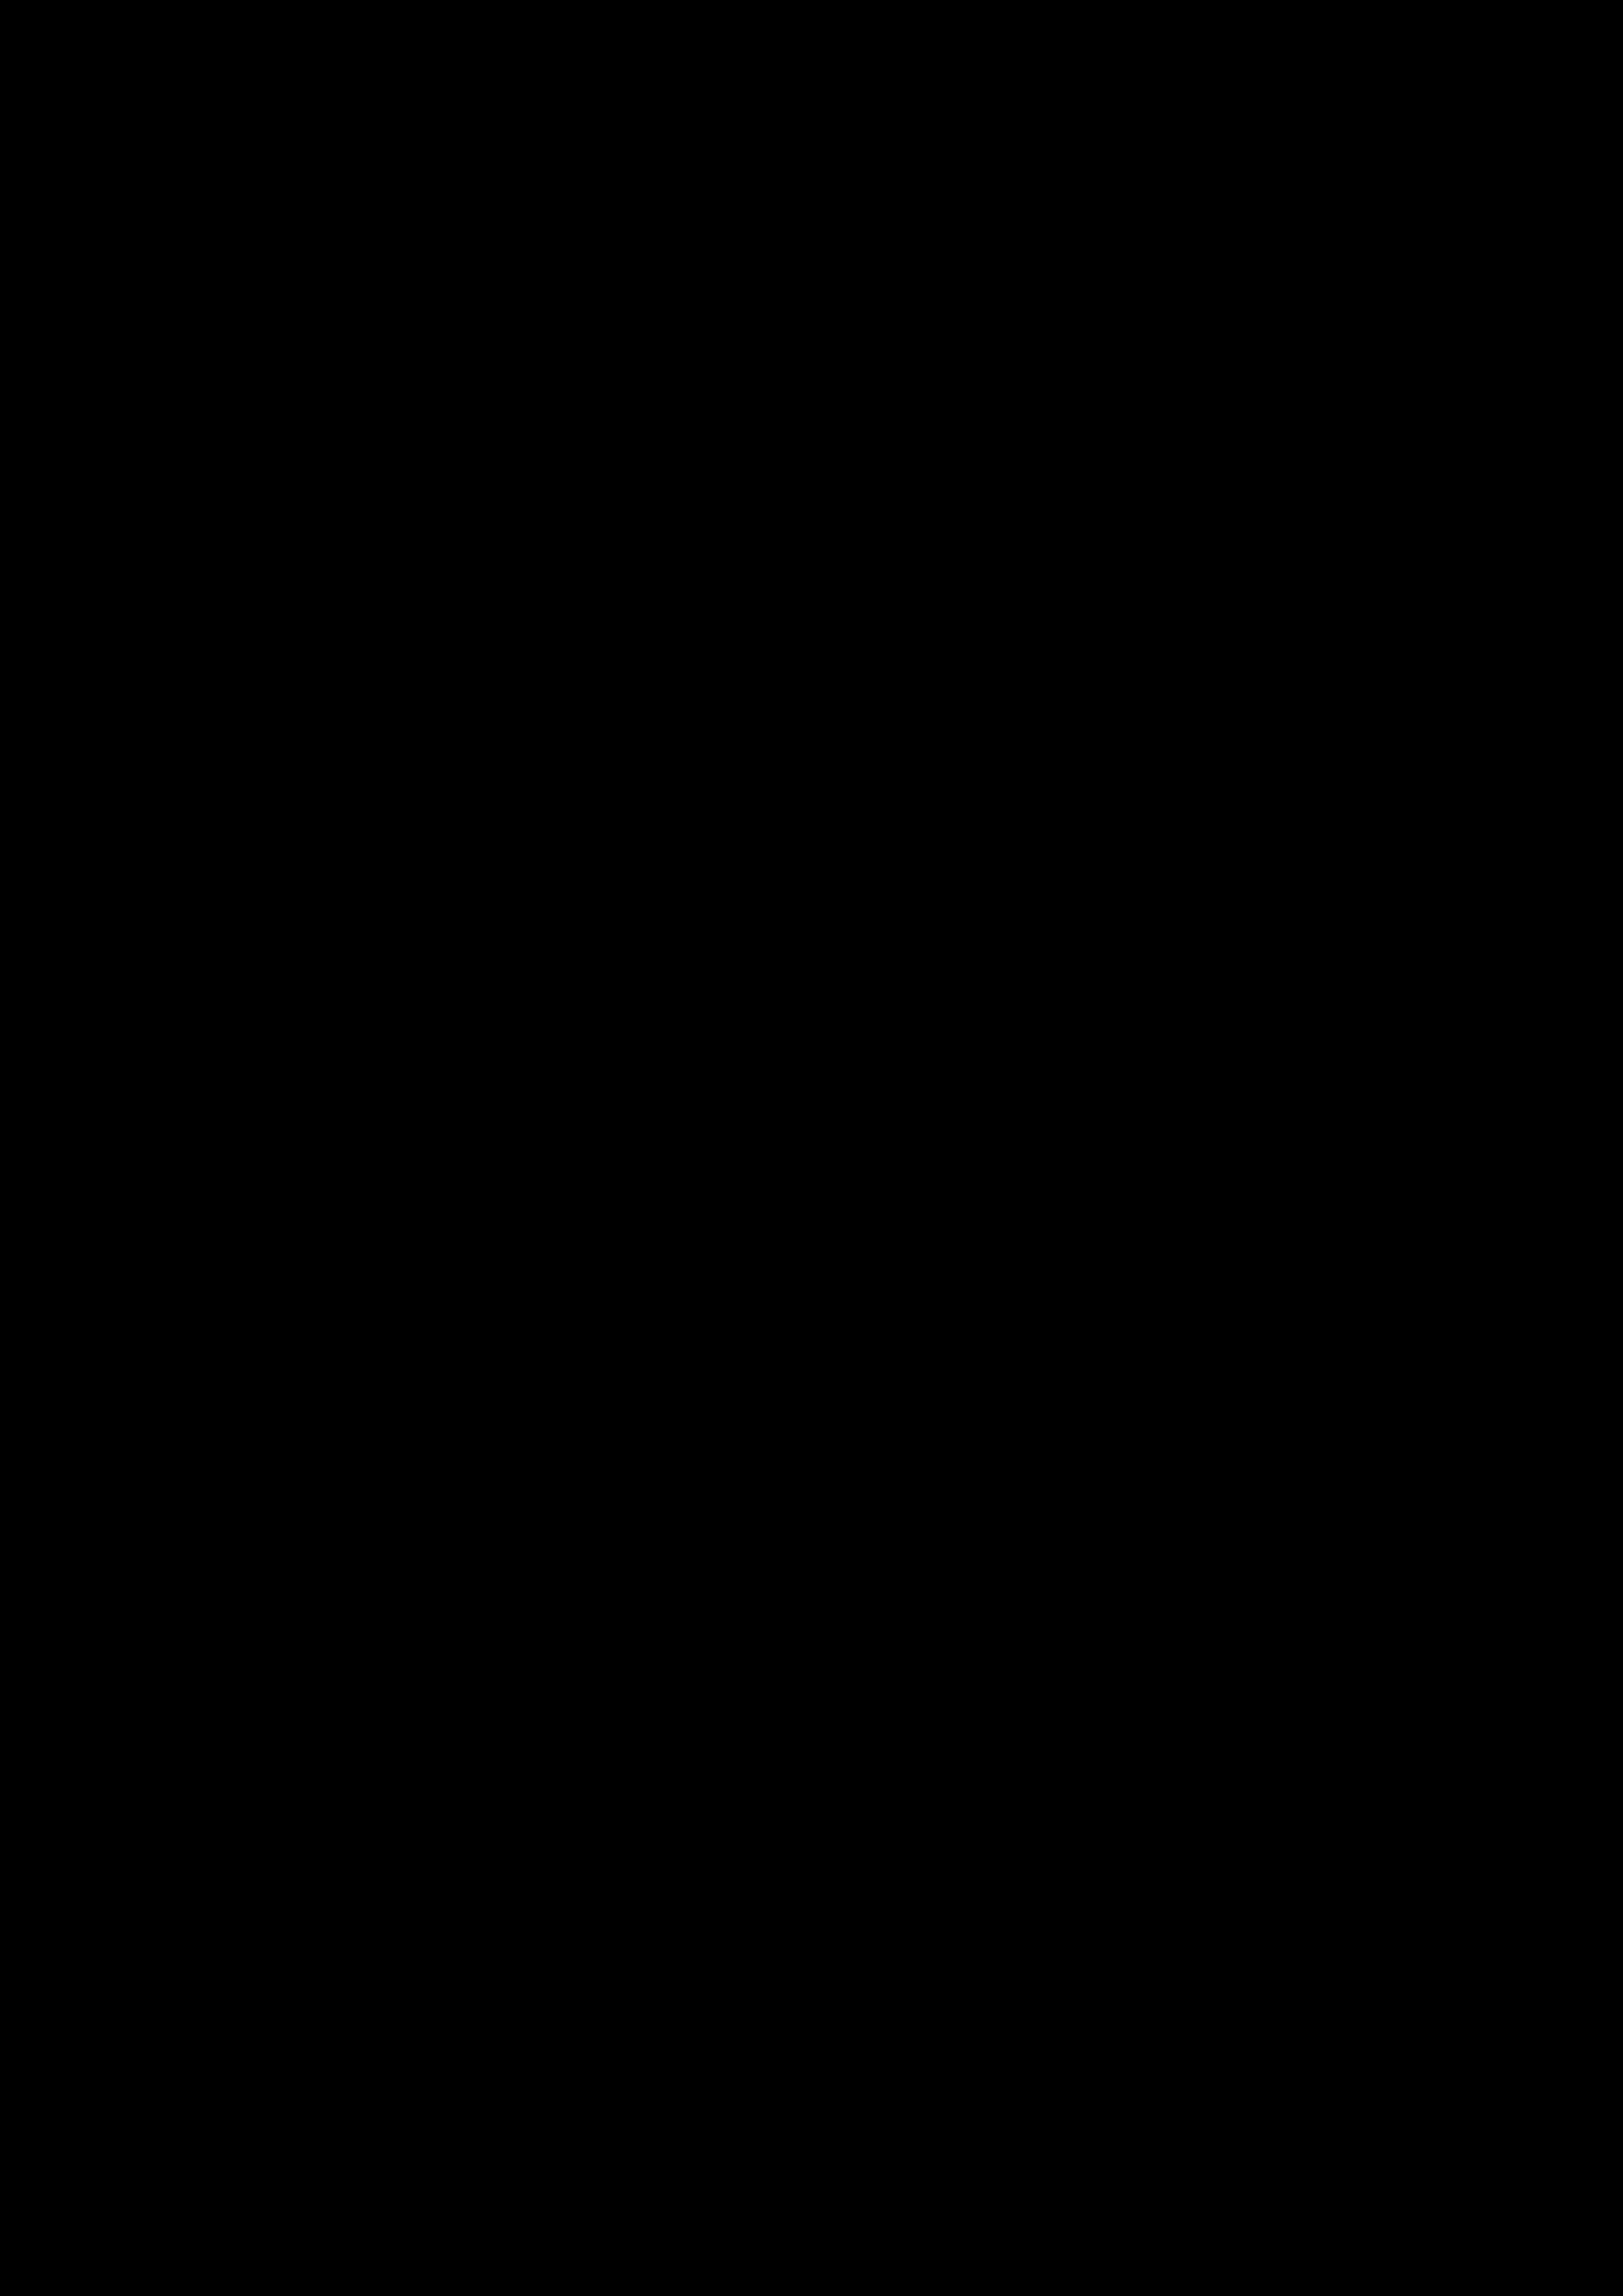 2480x3508 Black Solid Color Background